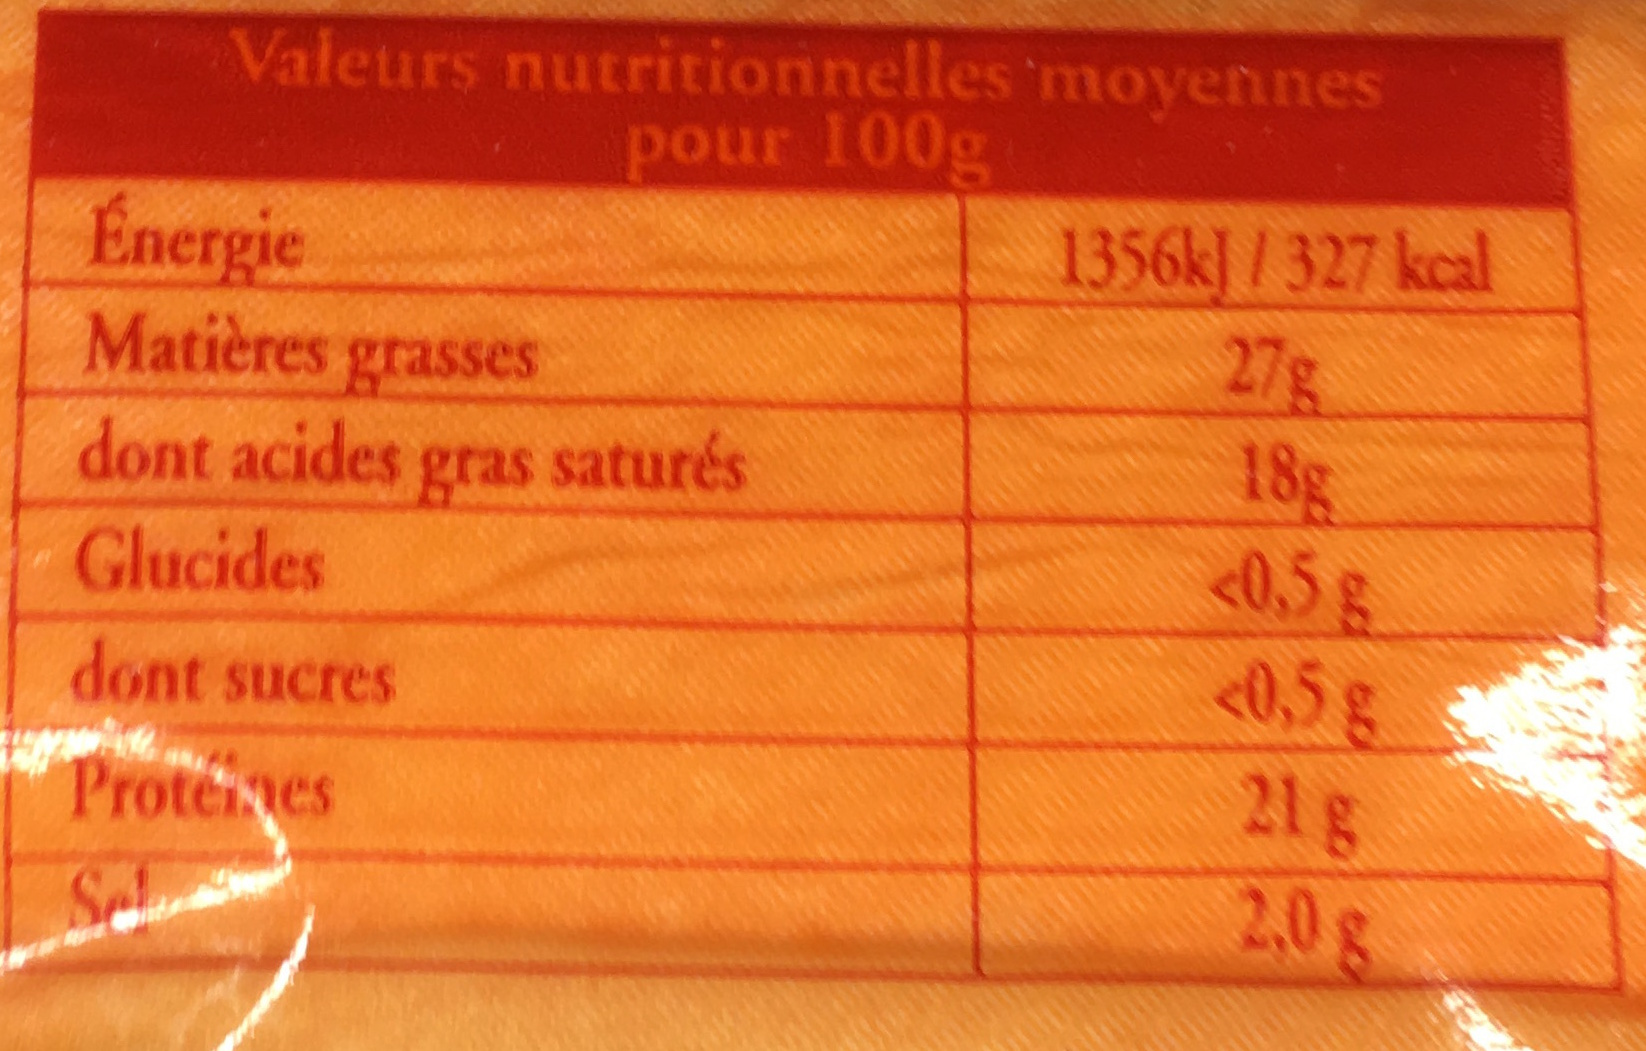 Quart Maroilles (27% MG) - Informations nutritionnelles - fr